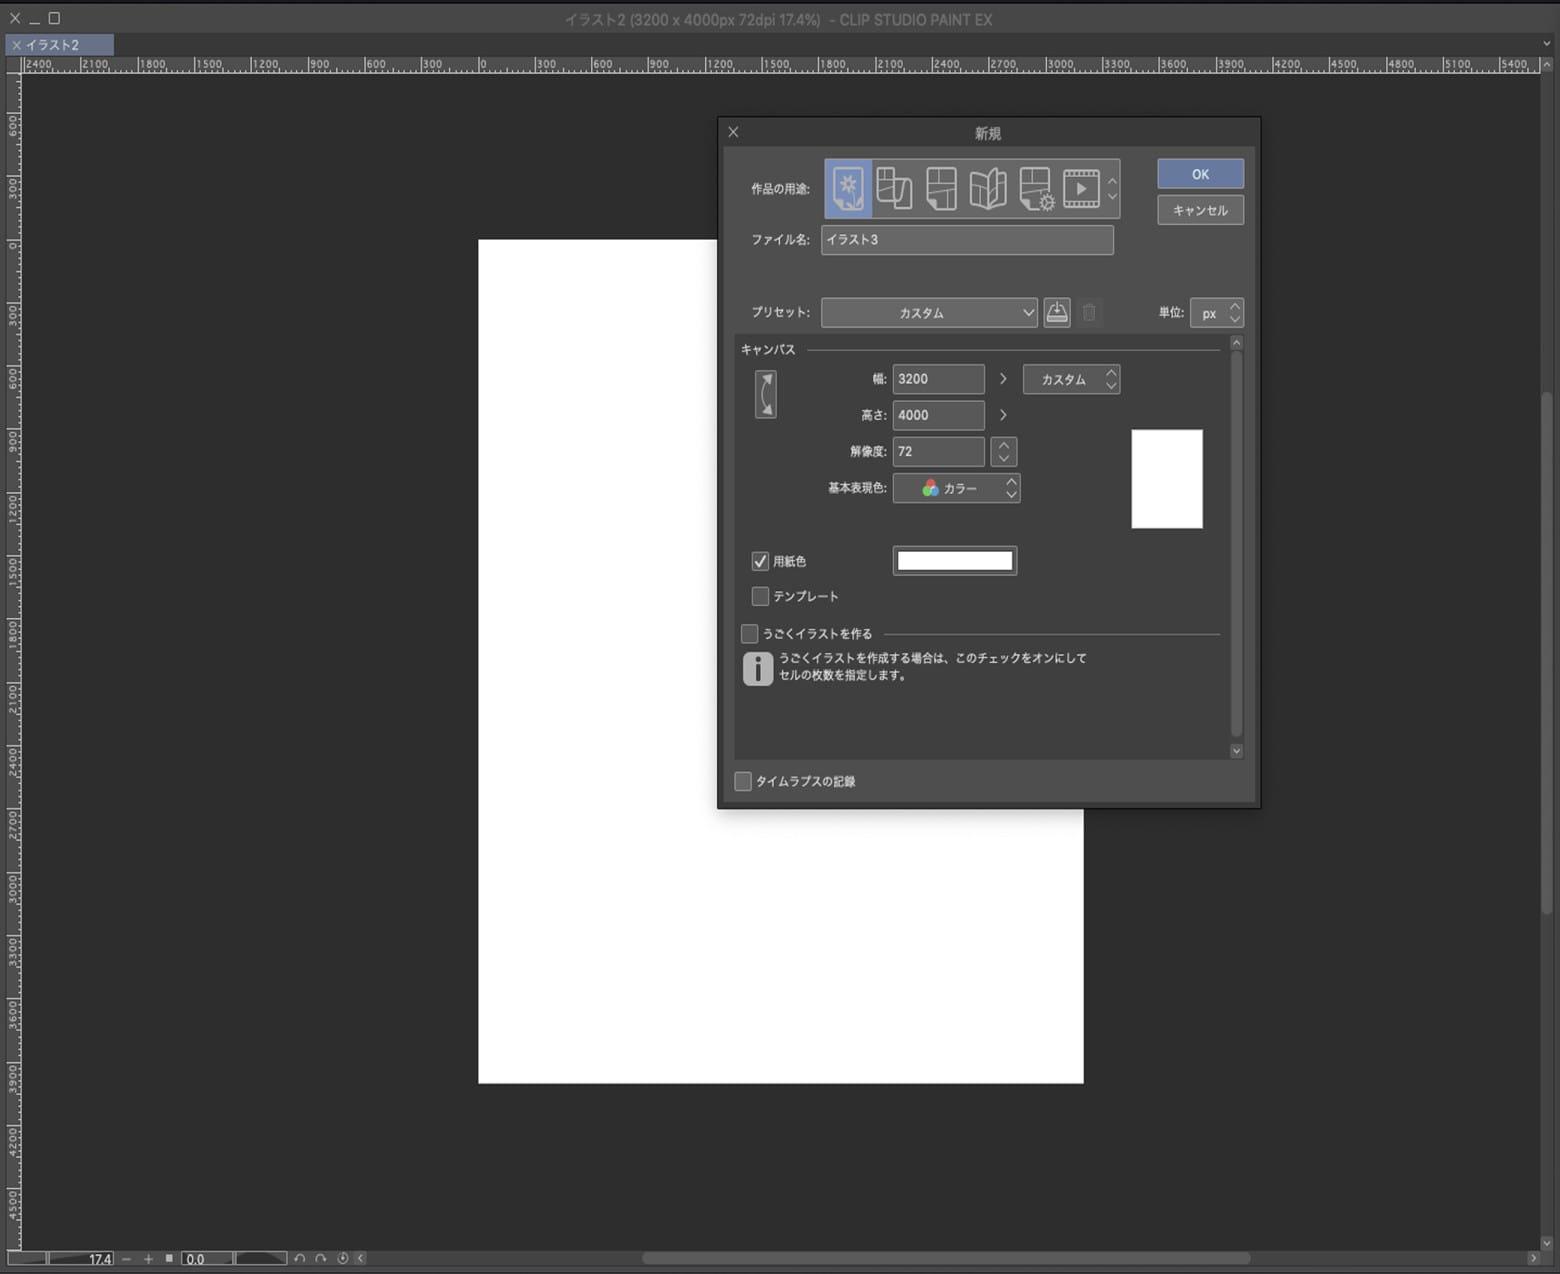 [CLIP STUDIO PAINT] Digital Thick Coating Tutorial